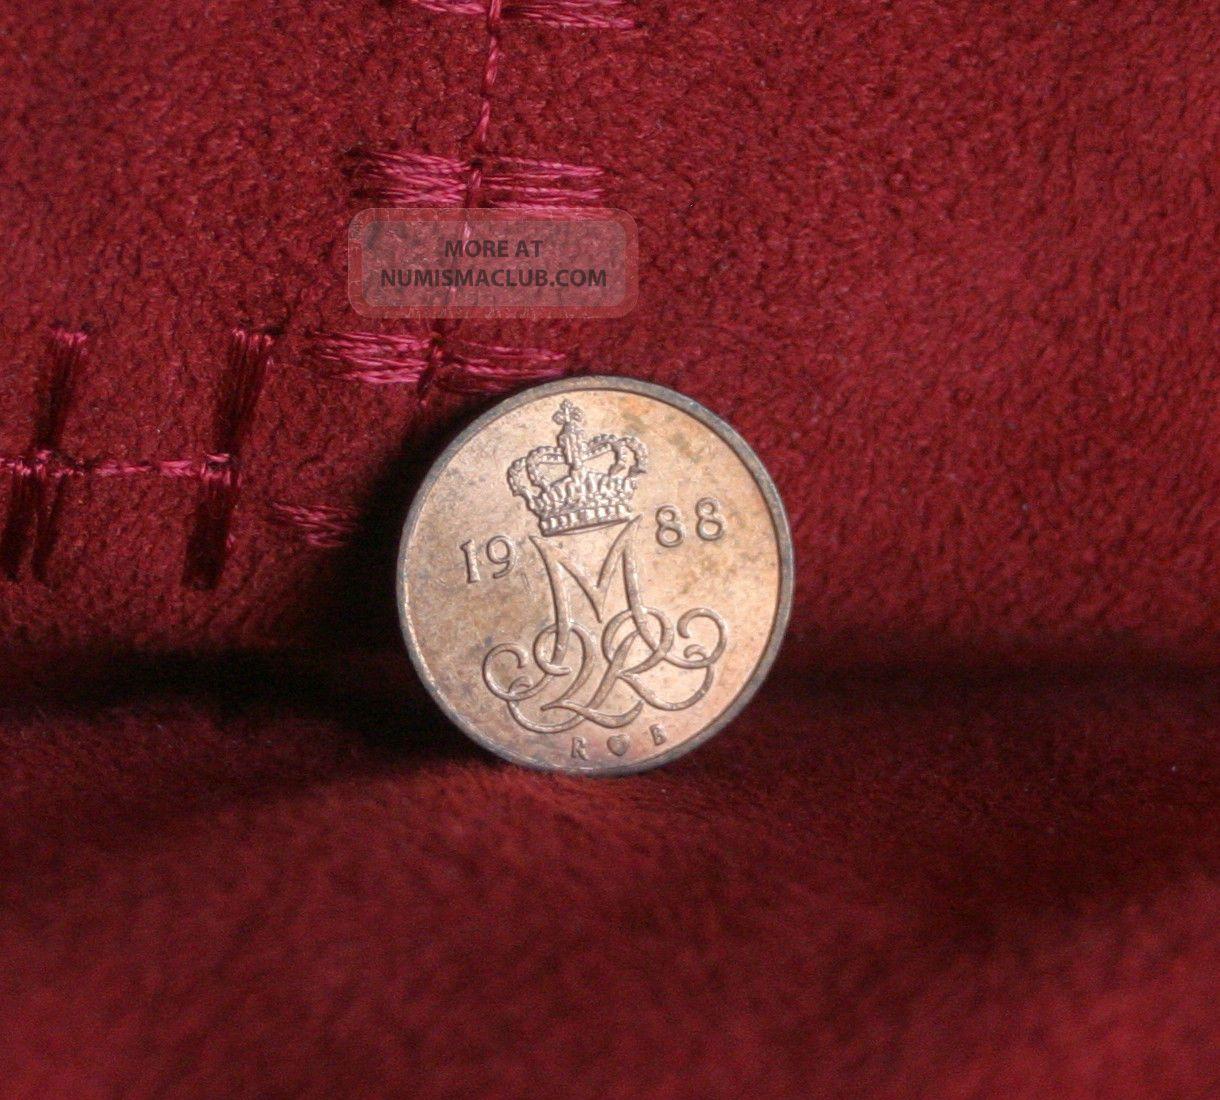 1988 Denmark 5 Ore Copper World Coin Km859.  3 Crowned Miir Monogram Margrethe Ii Europe photo